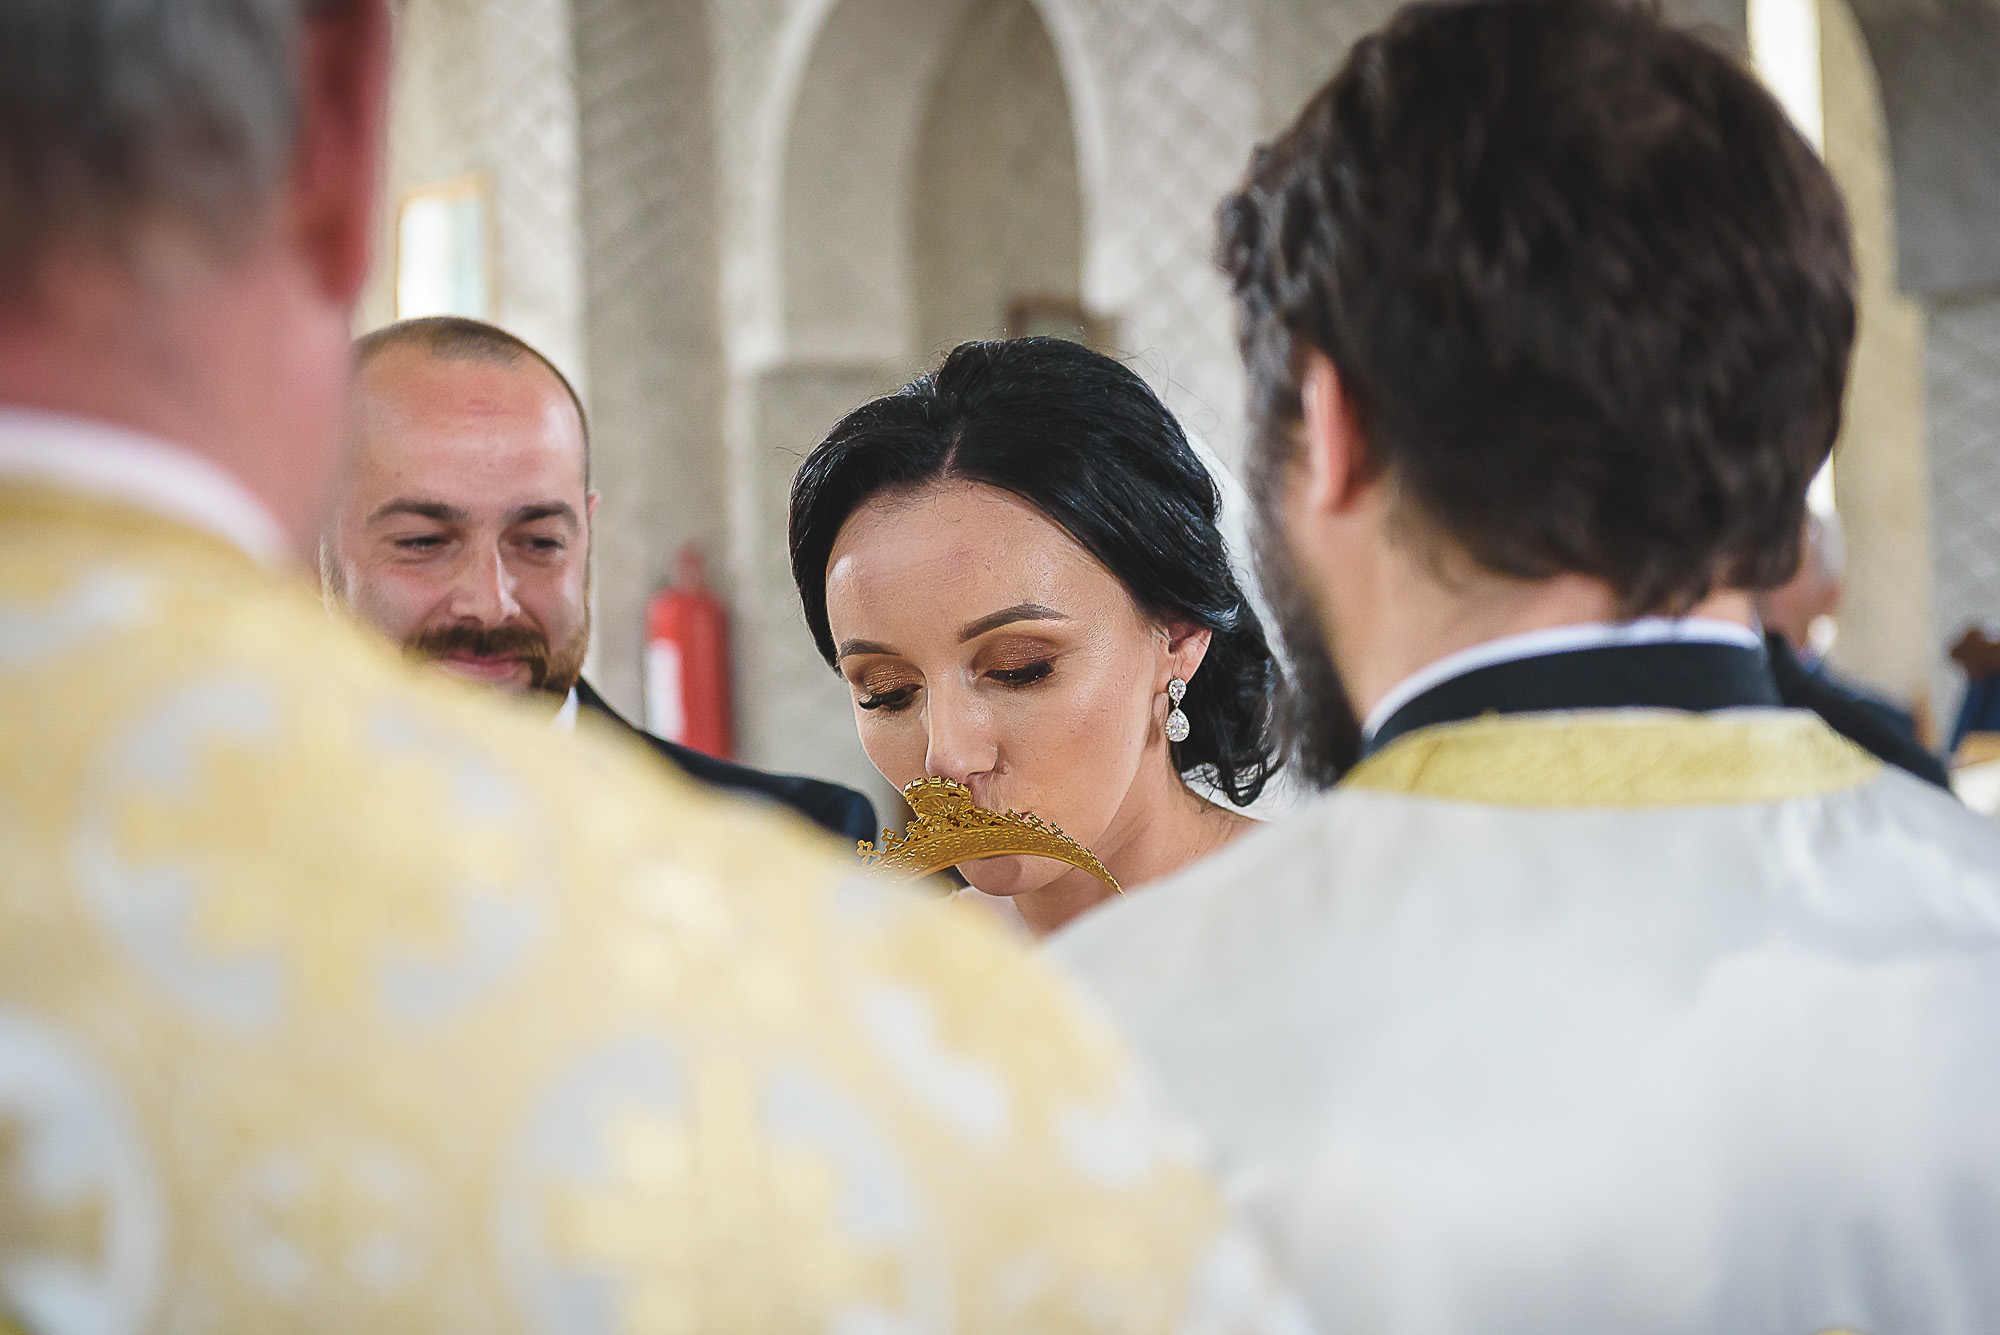 mireasa saruta coroana, cununia religioasa, biserica ortodoxa, fotografie creativa de nunta, fotograf nunta mures, foto nunta reghin, foto video reghin, foto video nunta mures